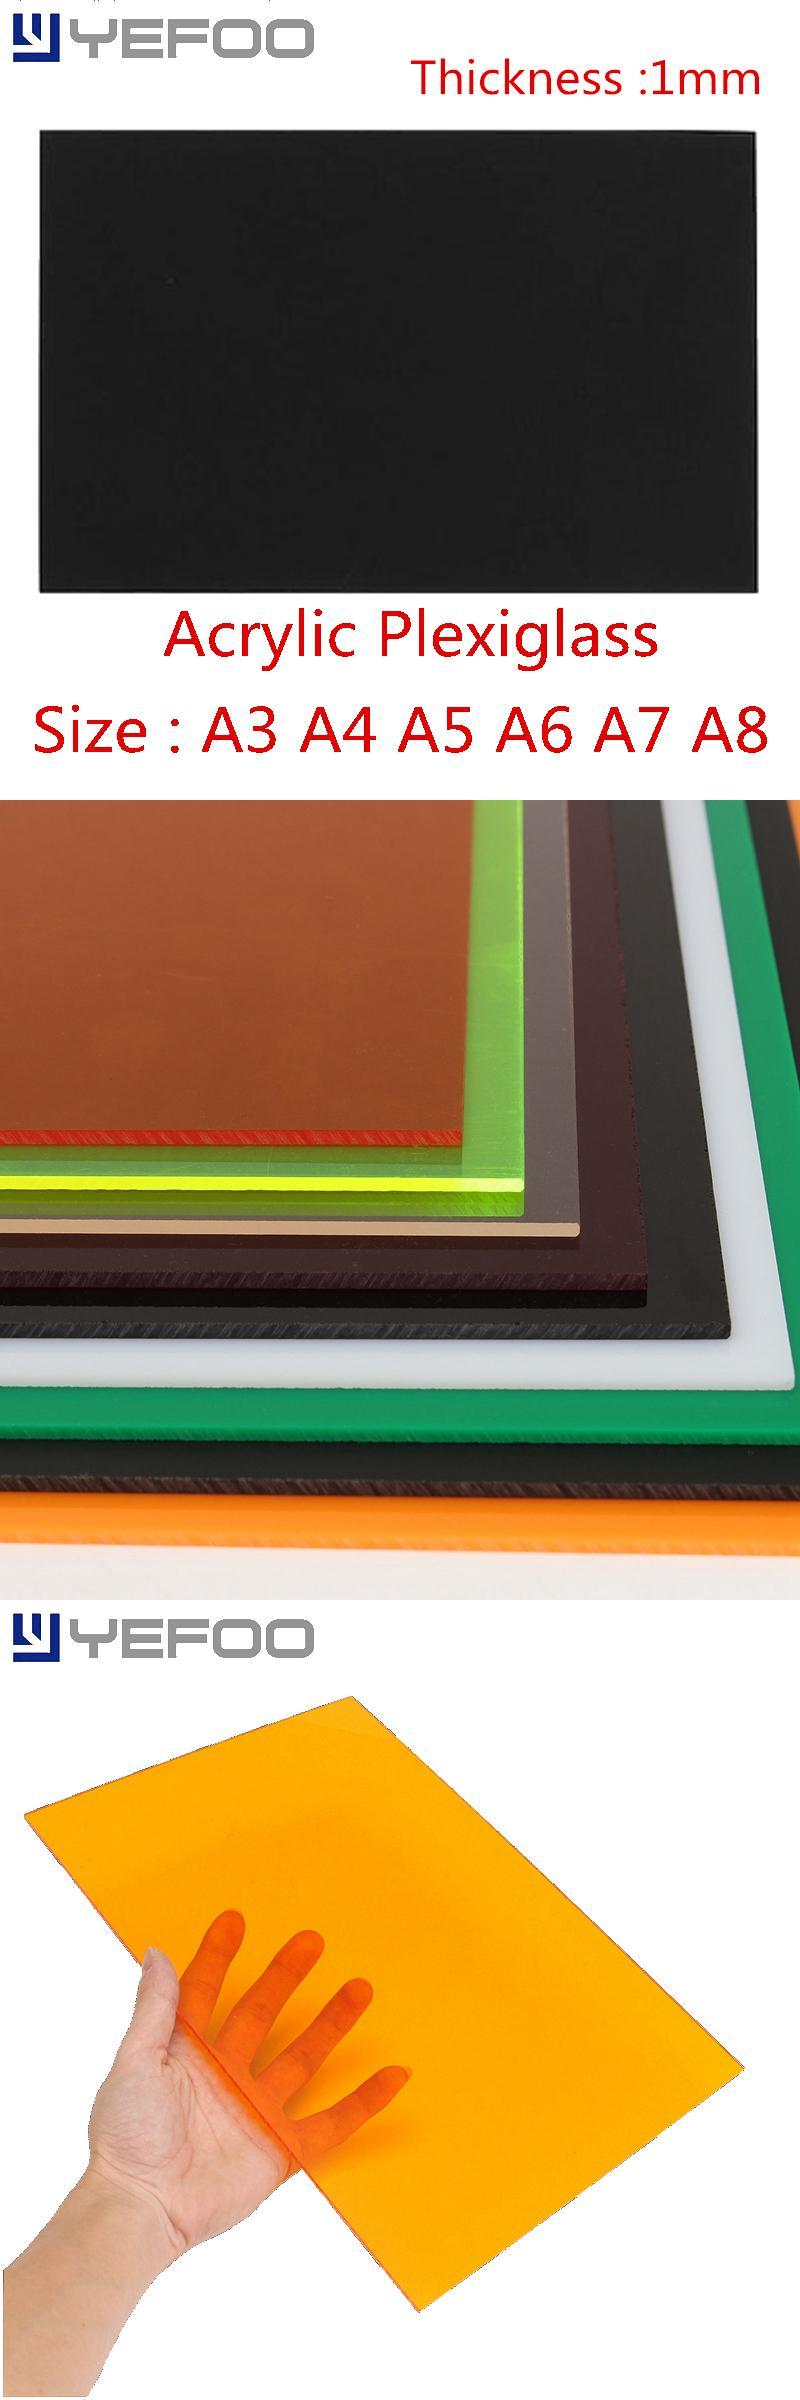 Visit To Buy 1mm Black Plastic Acrylic Plexiglass Perspex Sheet Pmma Plast A3 A4 A5 A6 A7 A8 Size 1mm 2mm 3mm 4mm 5mm 6mm 7m Perspex Sheet Plexiglass Perspex